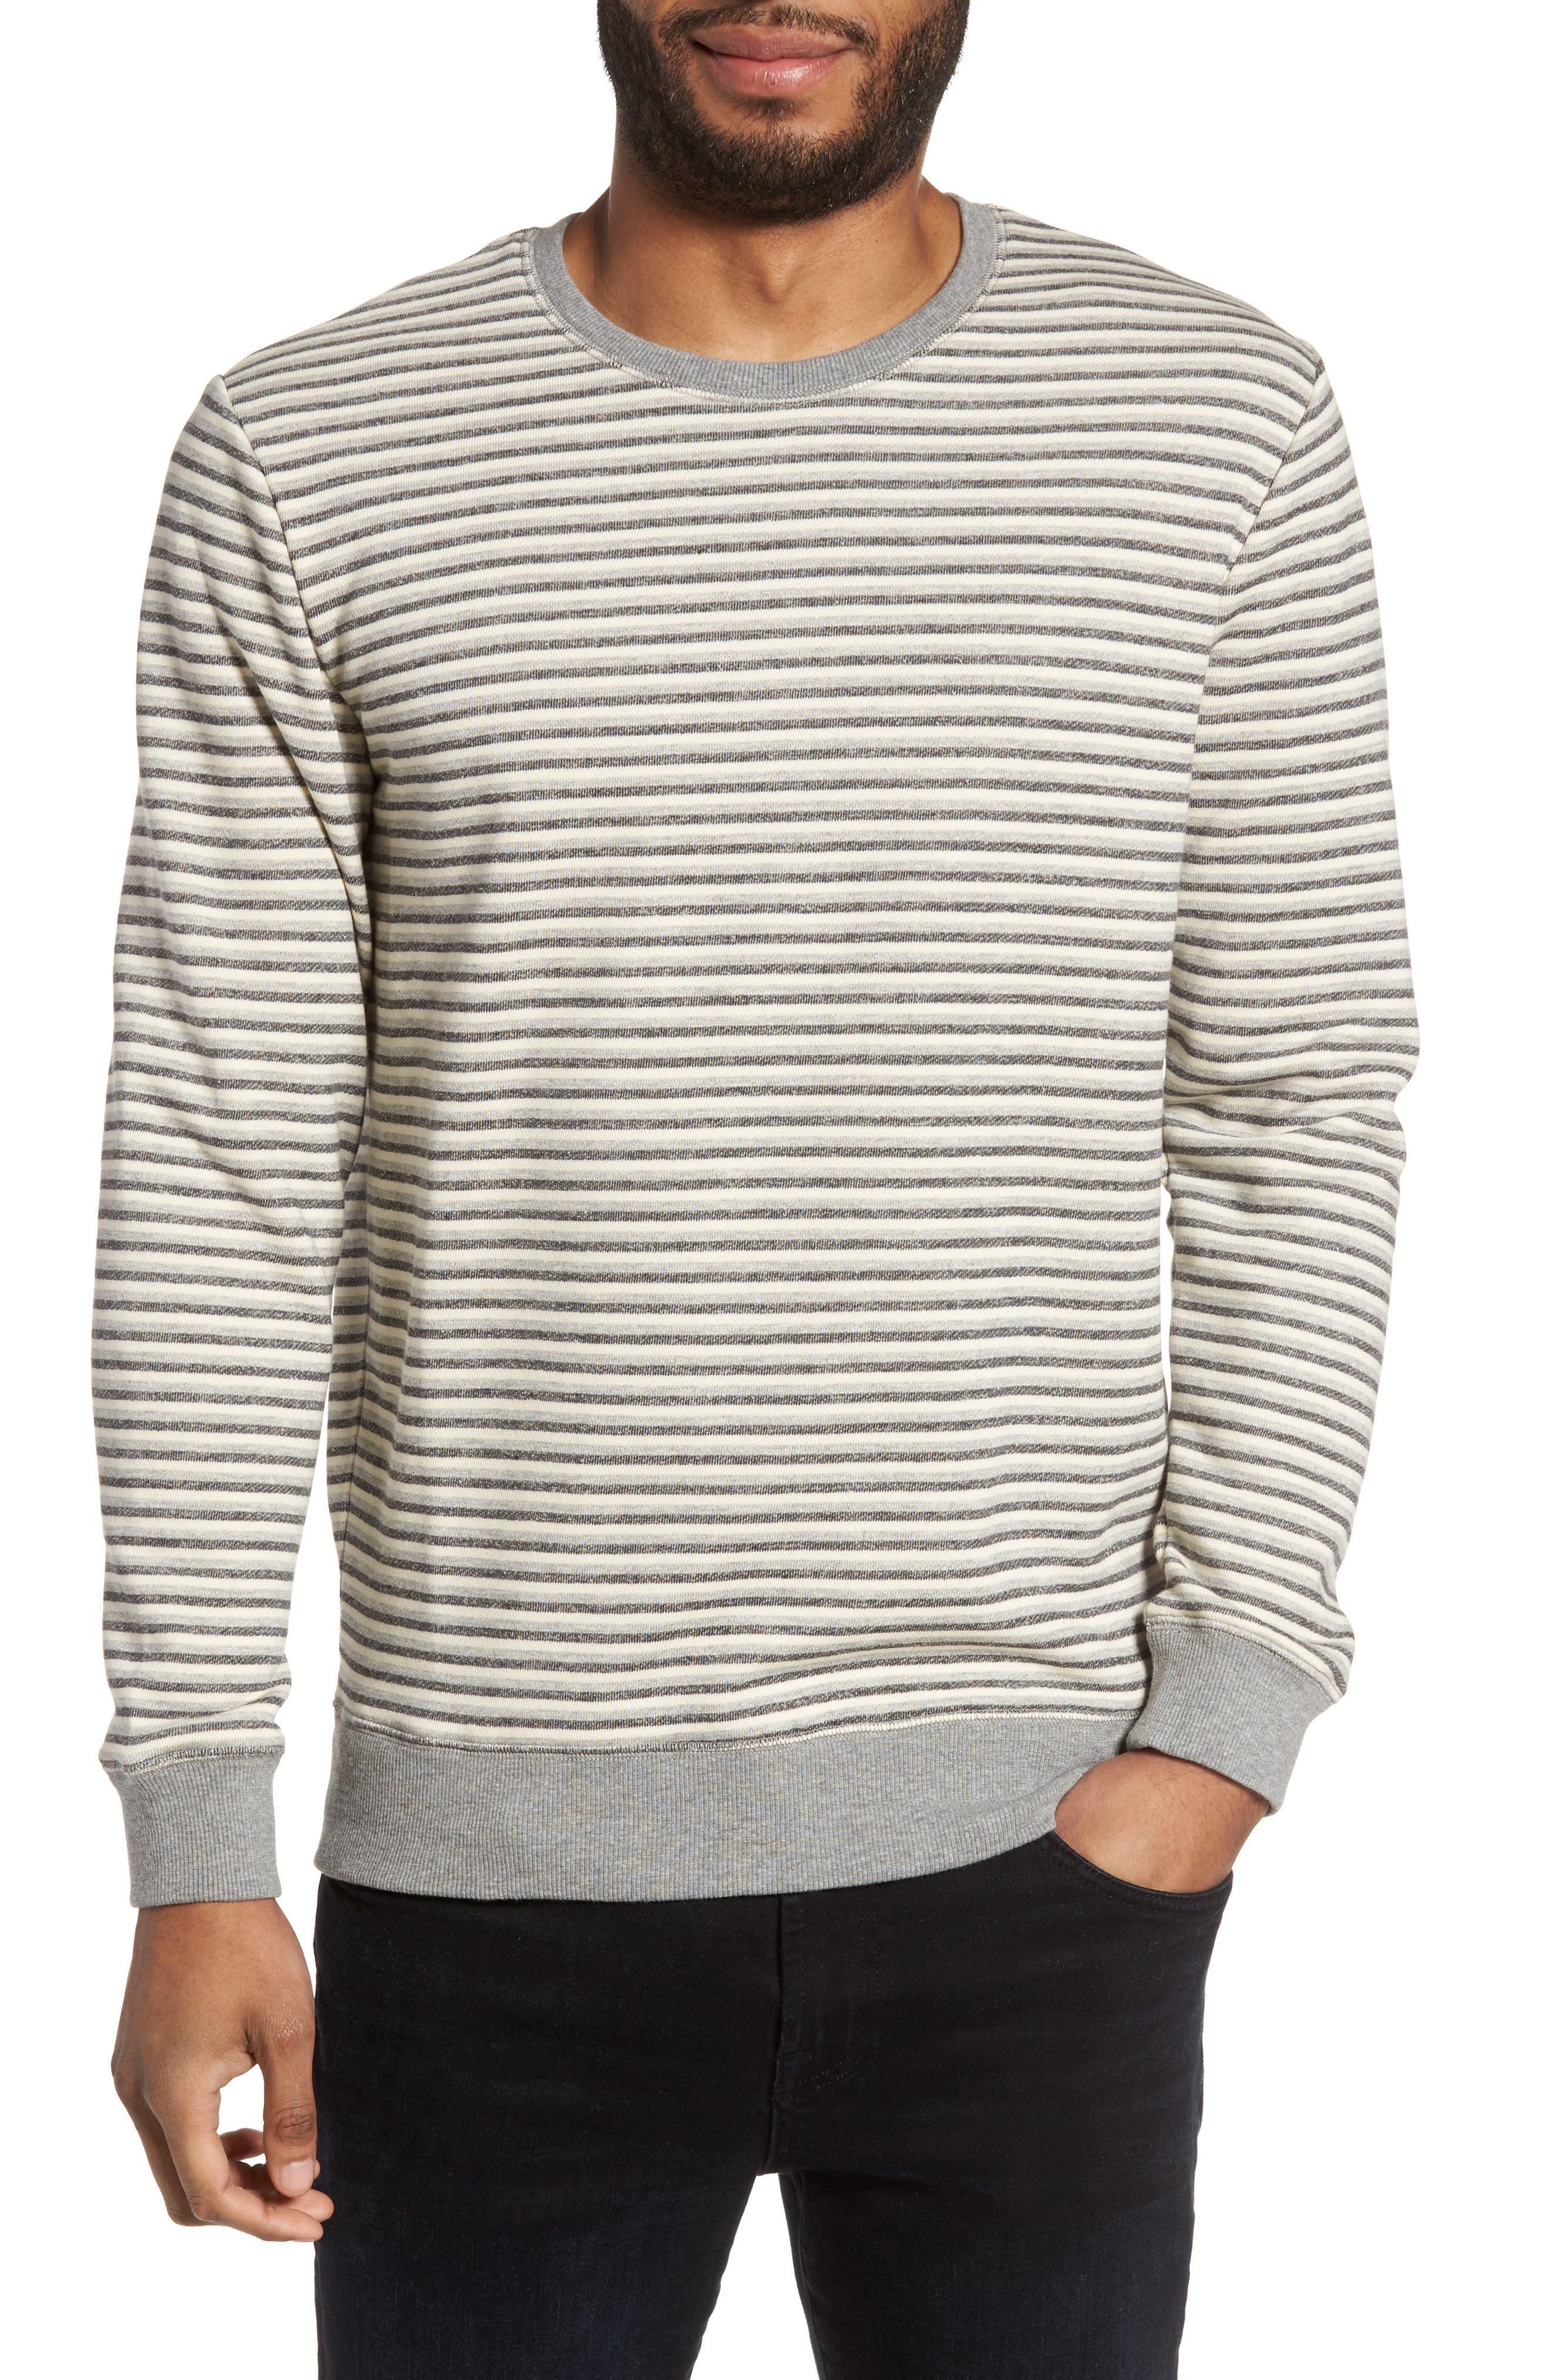 Alternate Image 1 Selected - Slate & Stone Stripe Crewneck Sweatshirt